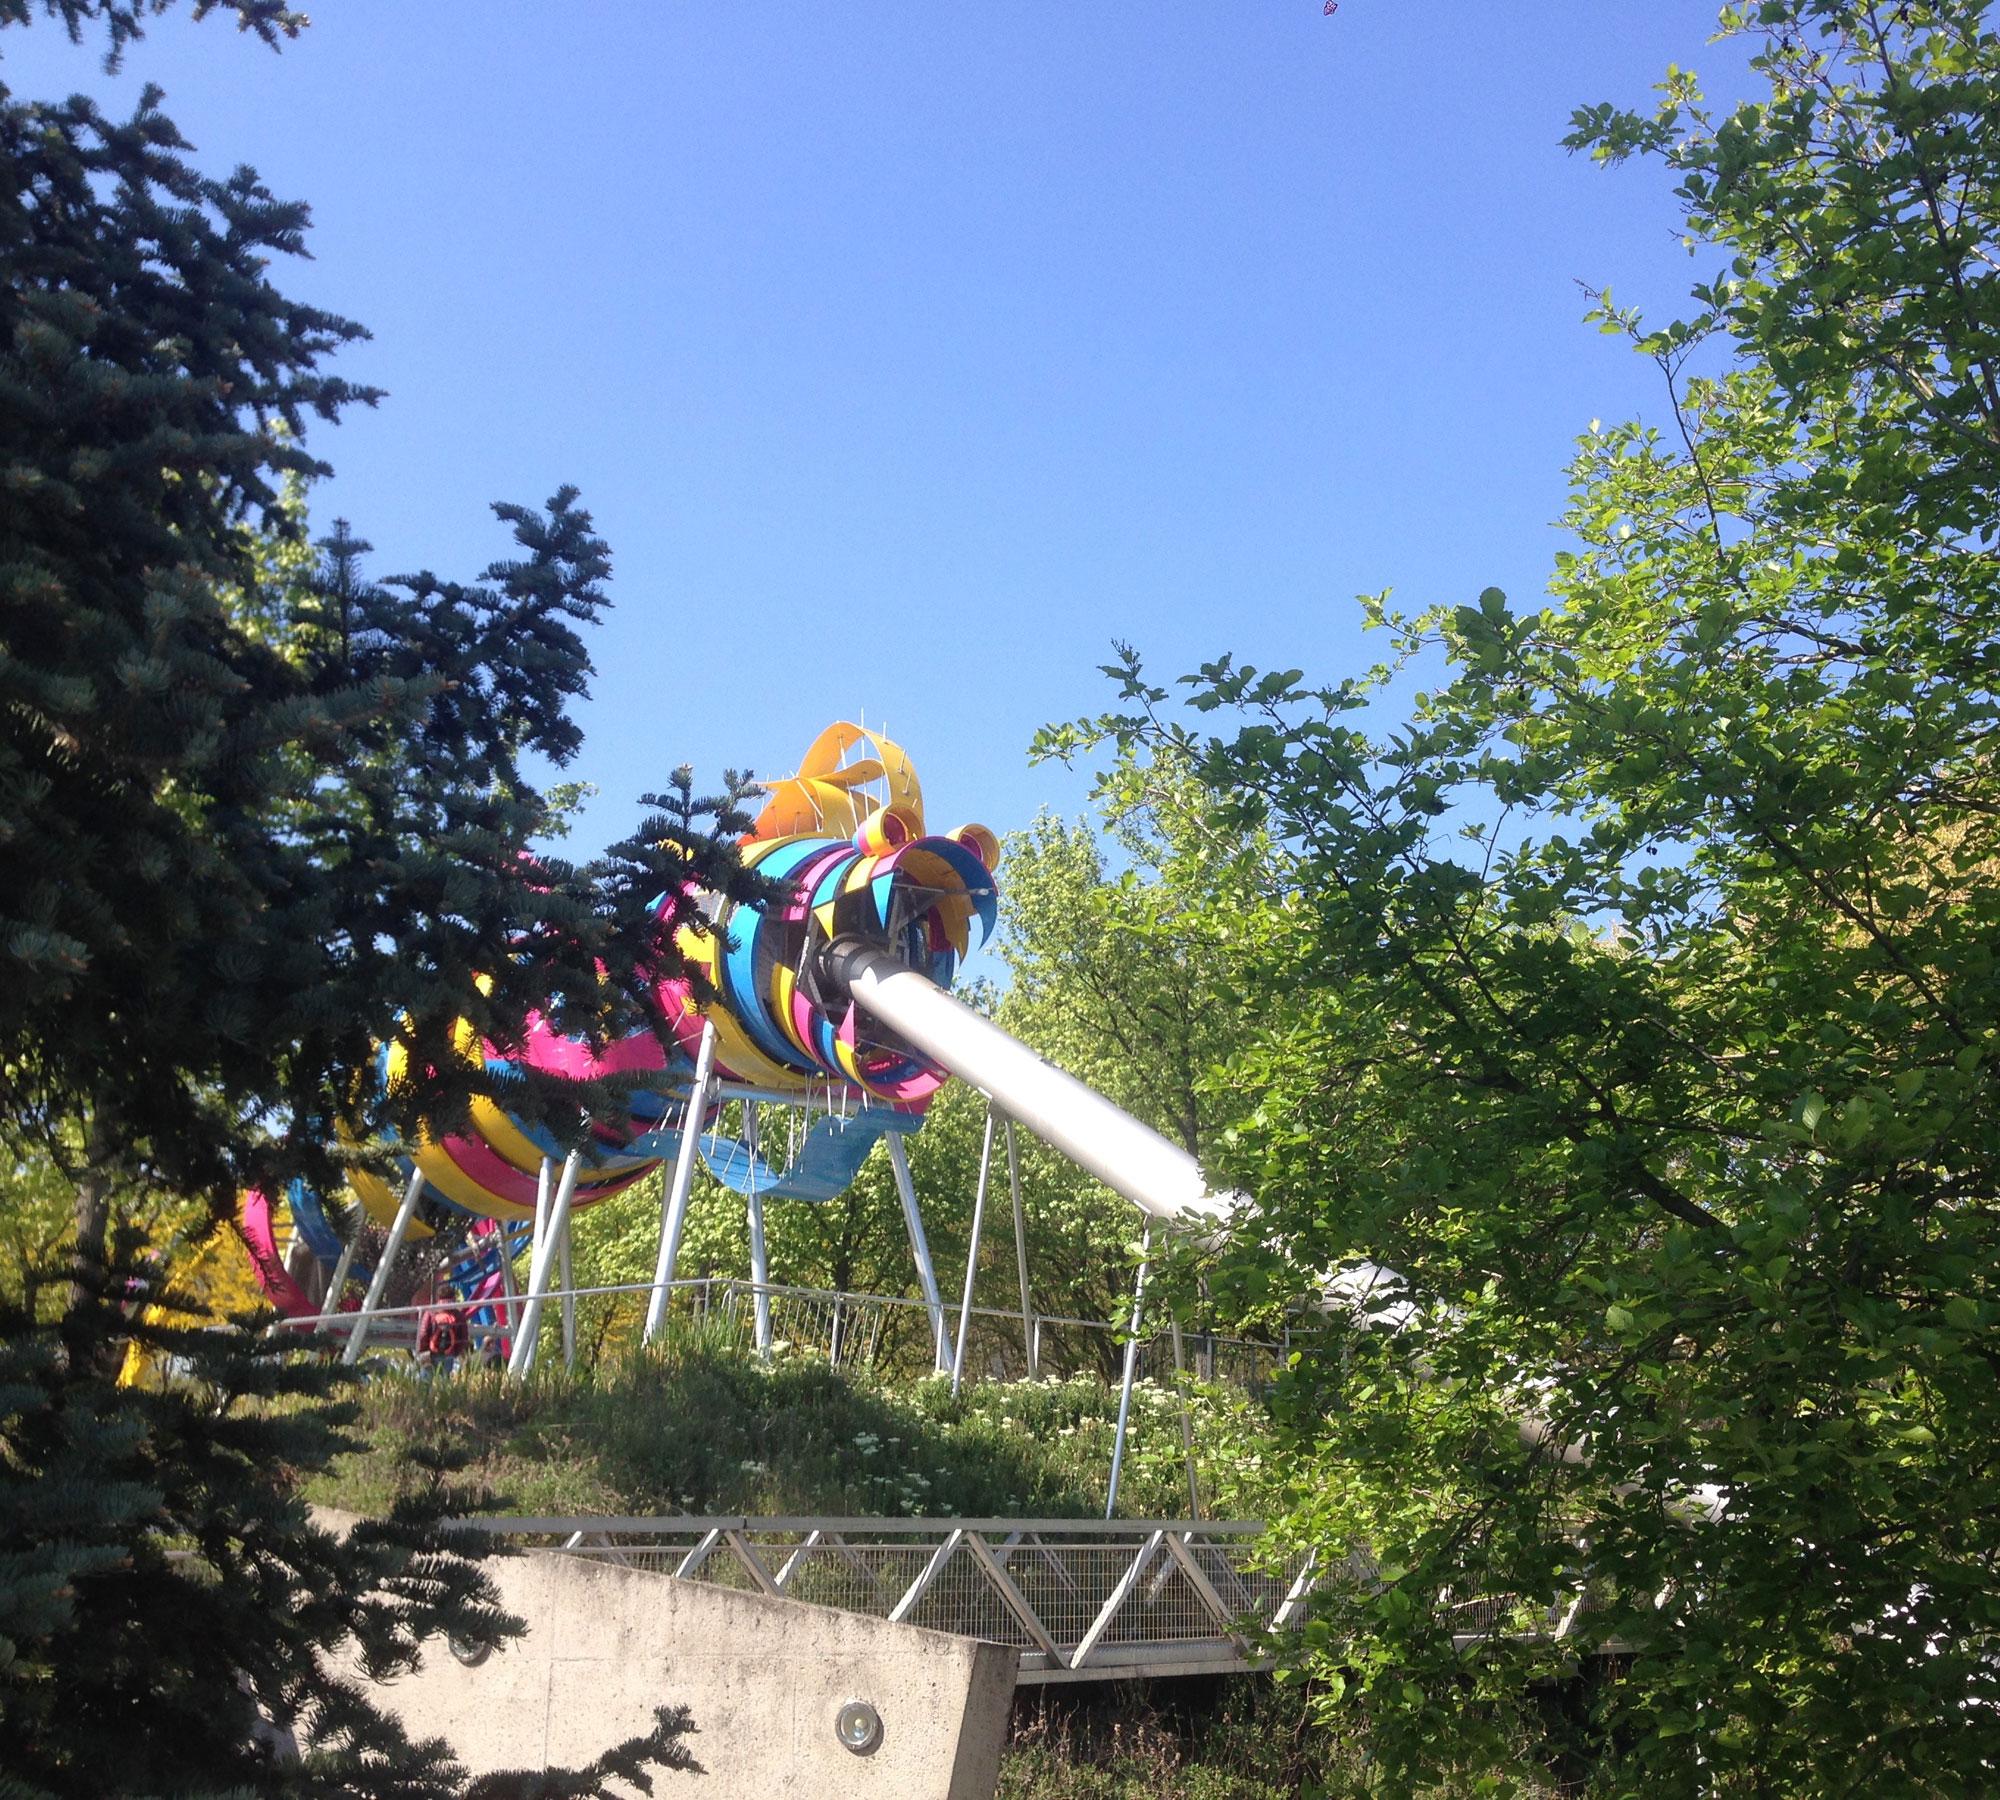 Spielplatz im Parc de la Villette | HIMBEER Magazin